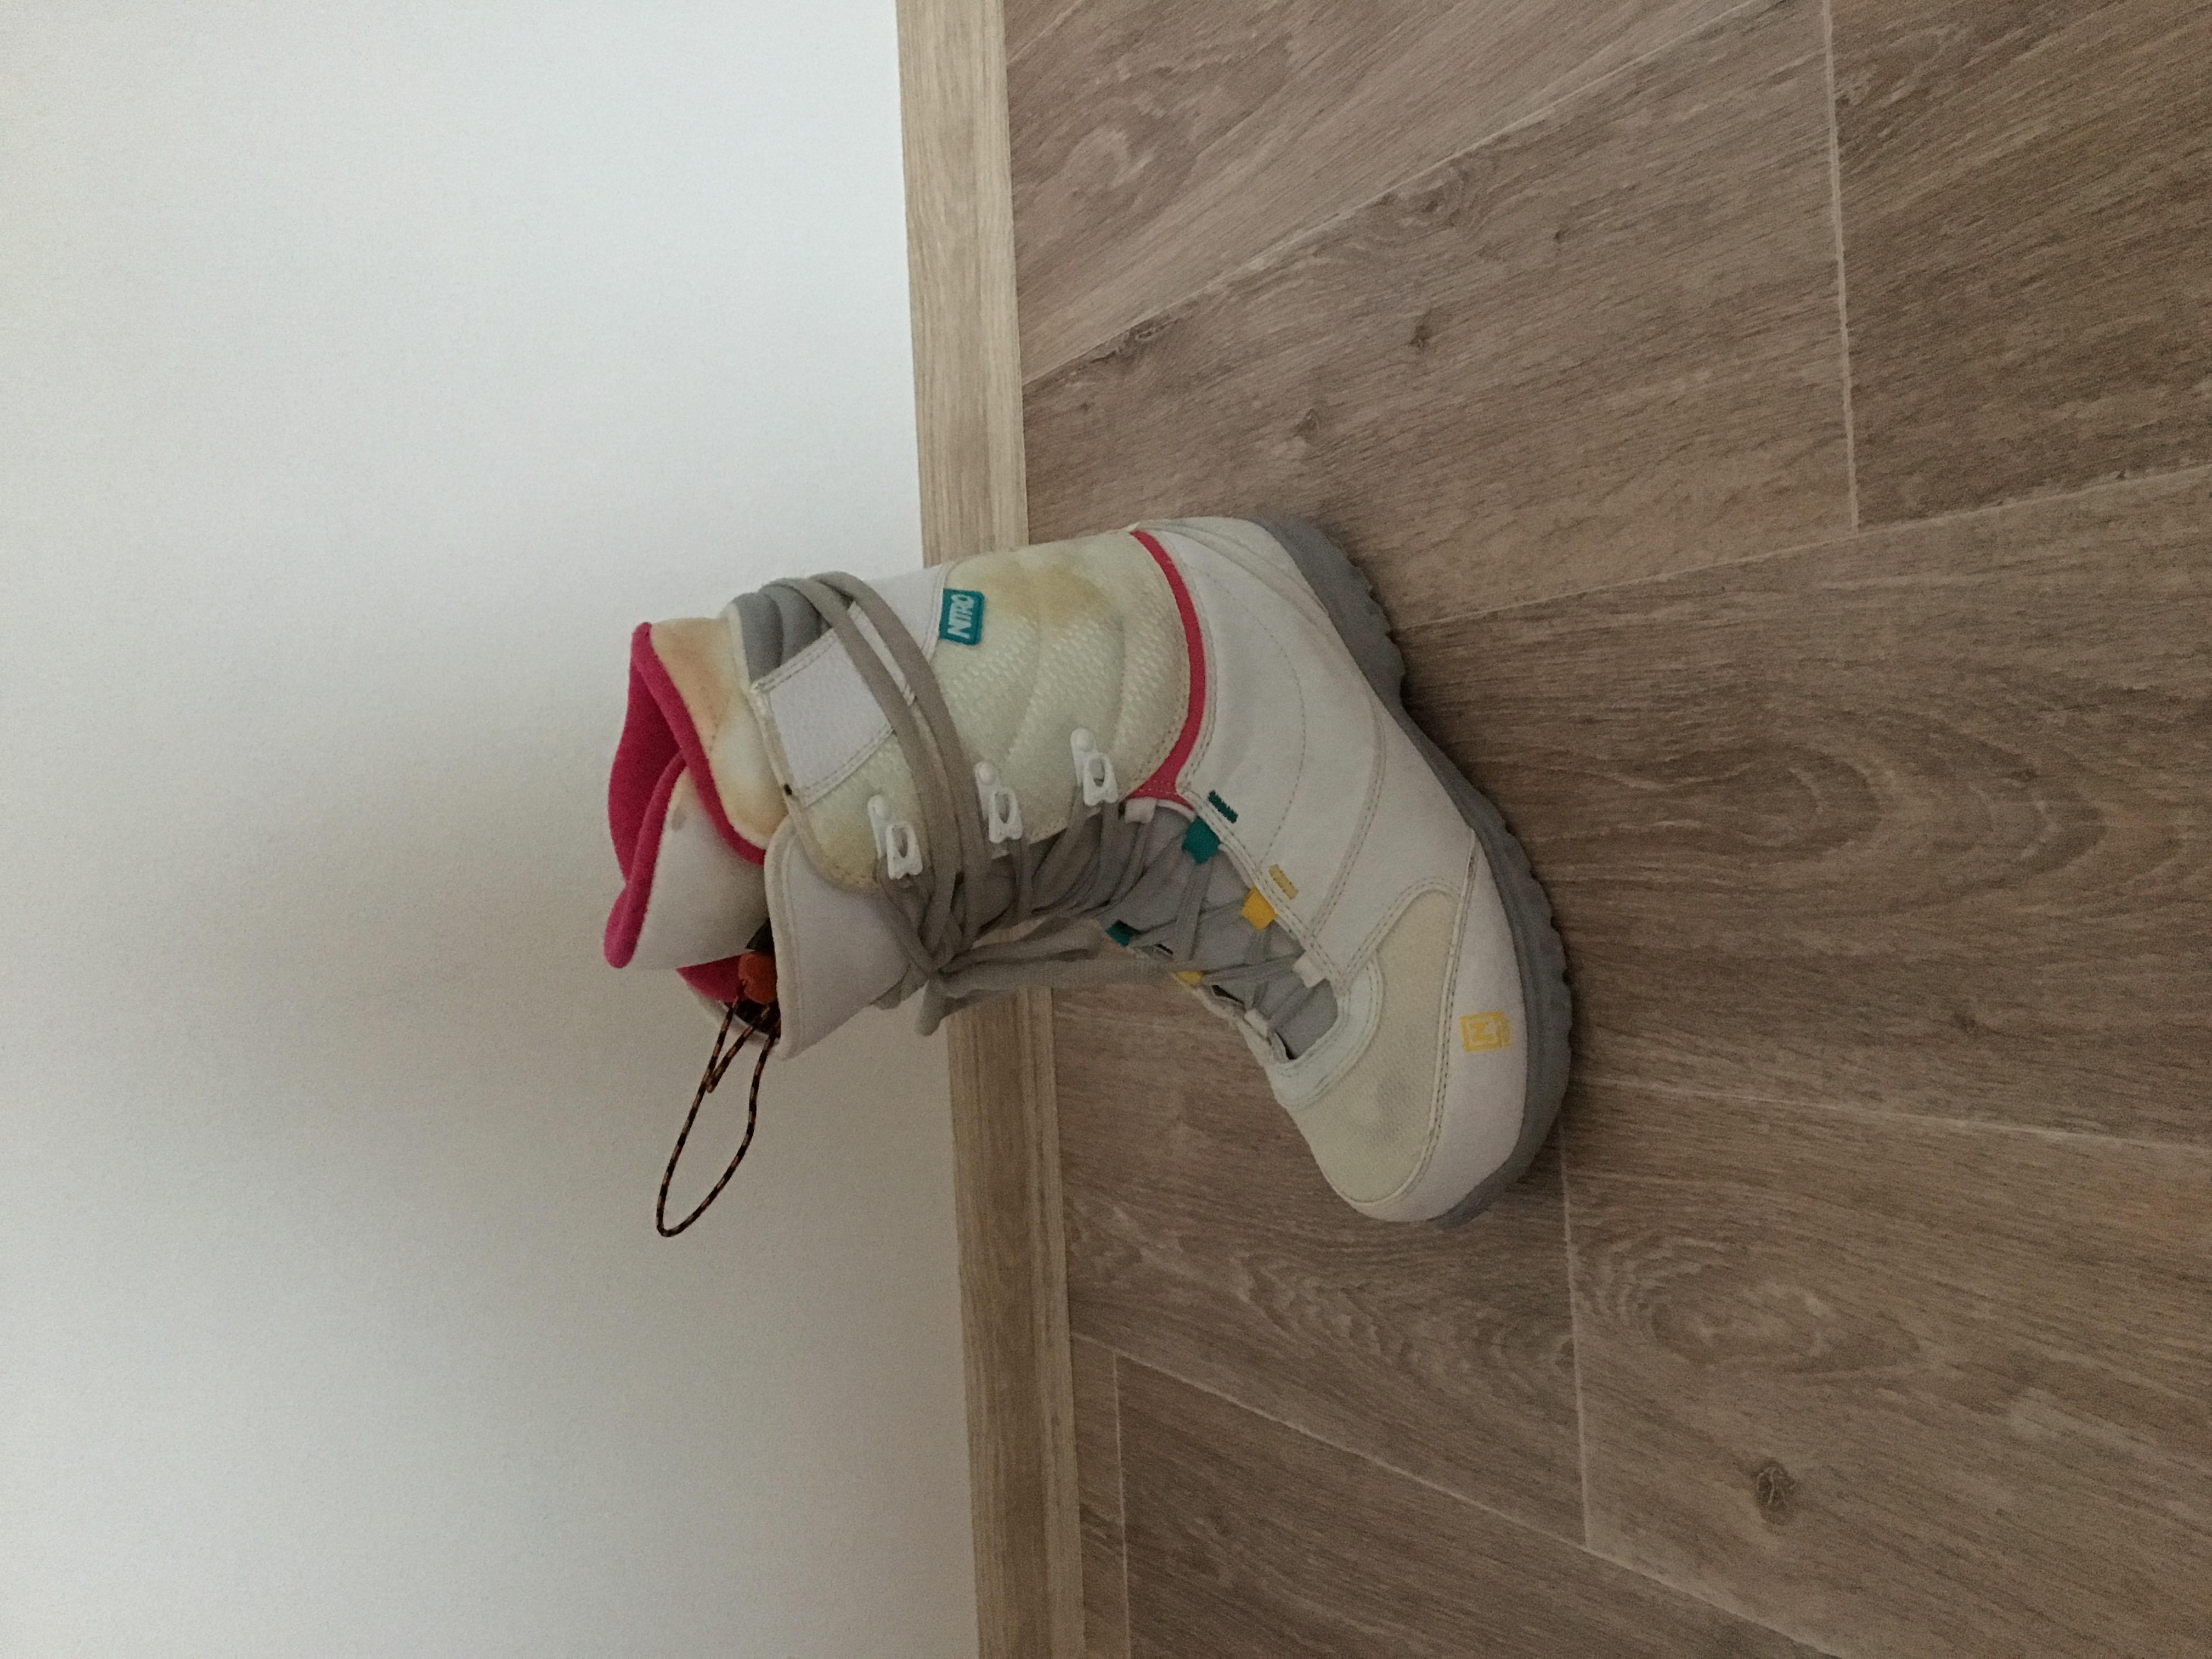 42 - fotka 2 Dámské snowboard boty NITRO vel. 42 - fotka 3 e053ec3ac2